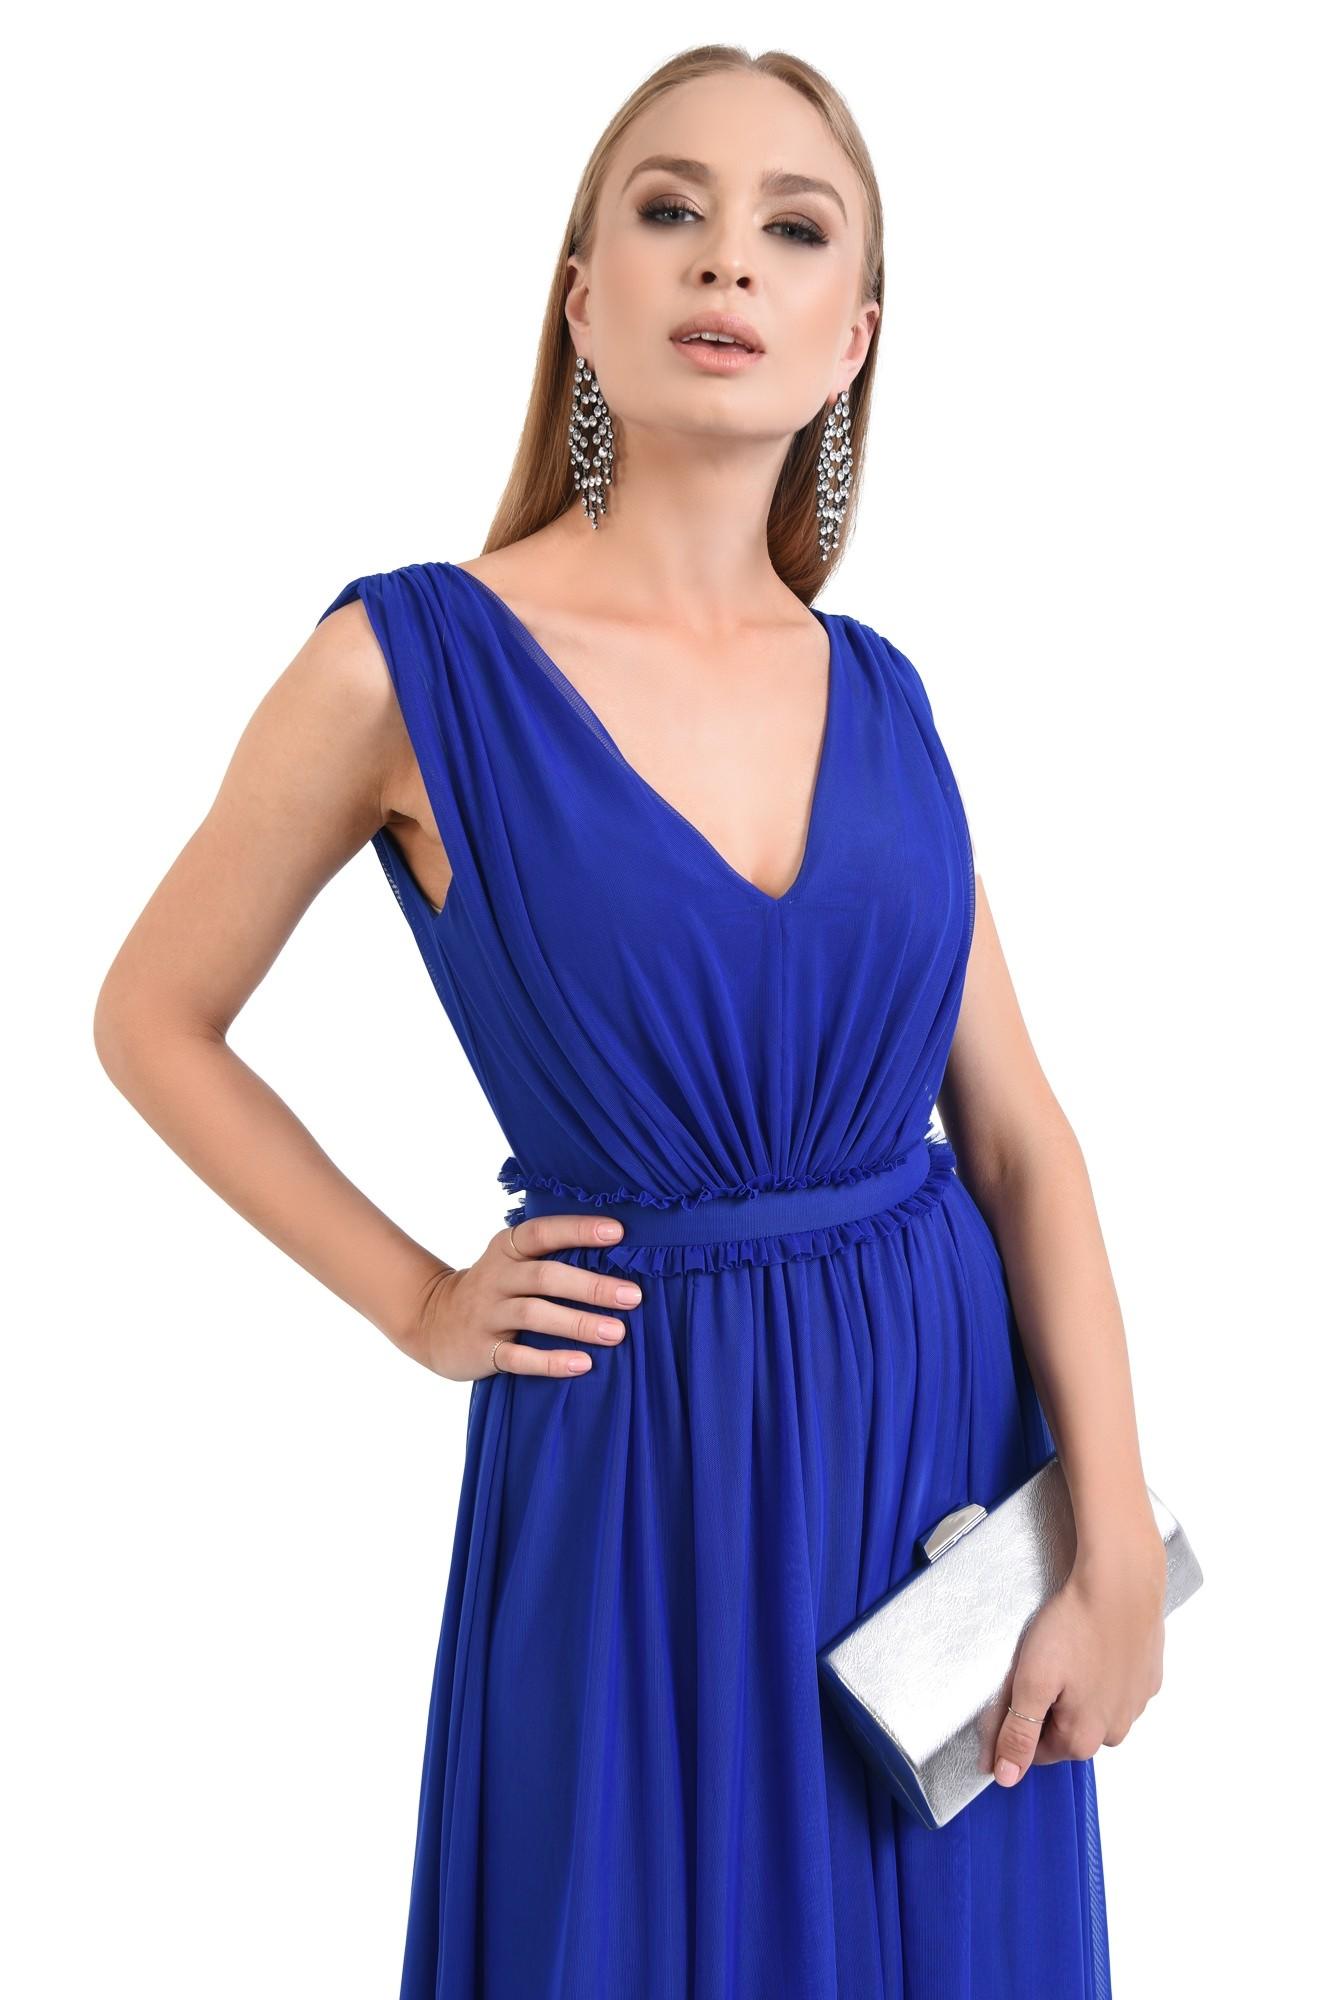 0 - 360 - rochie de seara, tul, albastru, clos, midi, rochii online